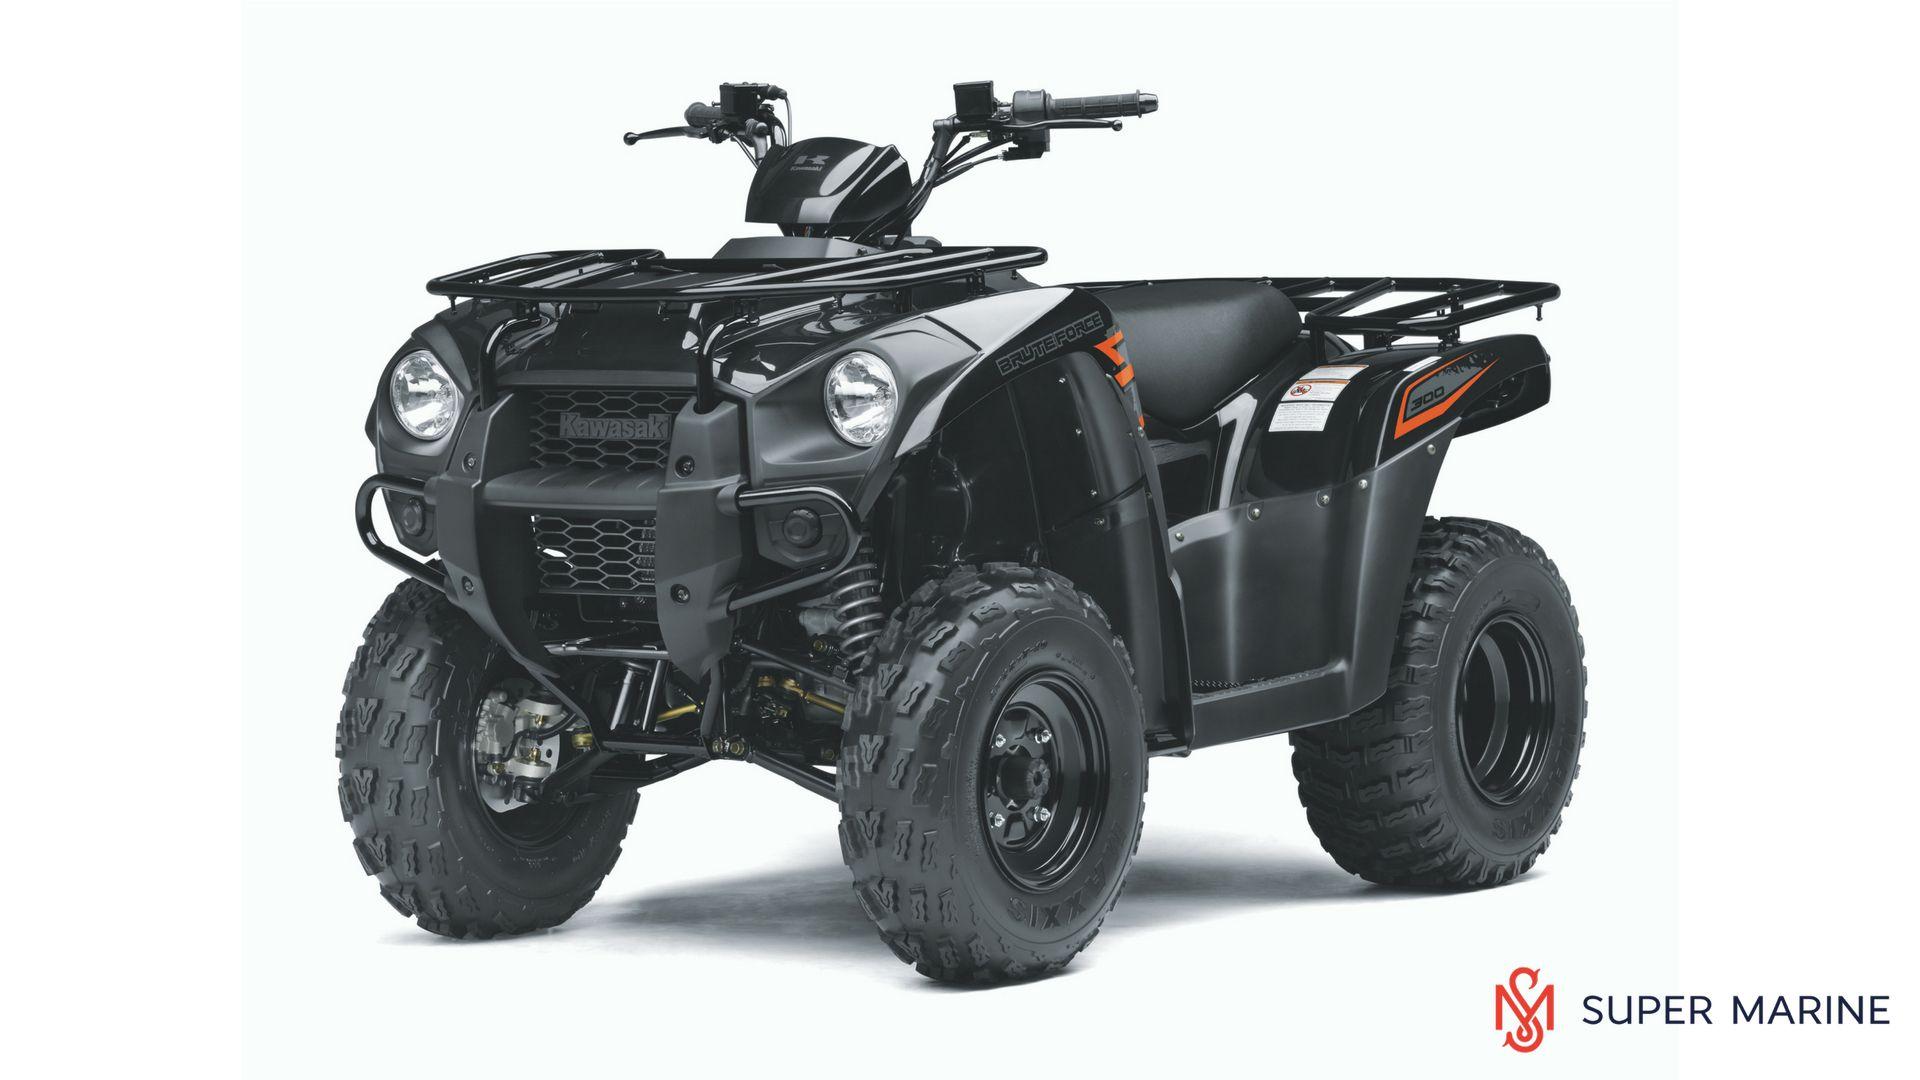 Квадроцикл Kawasaki Brute Force 300 Черный 2020 - 1